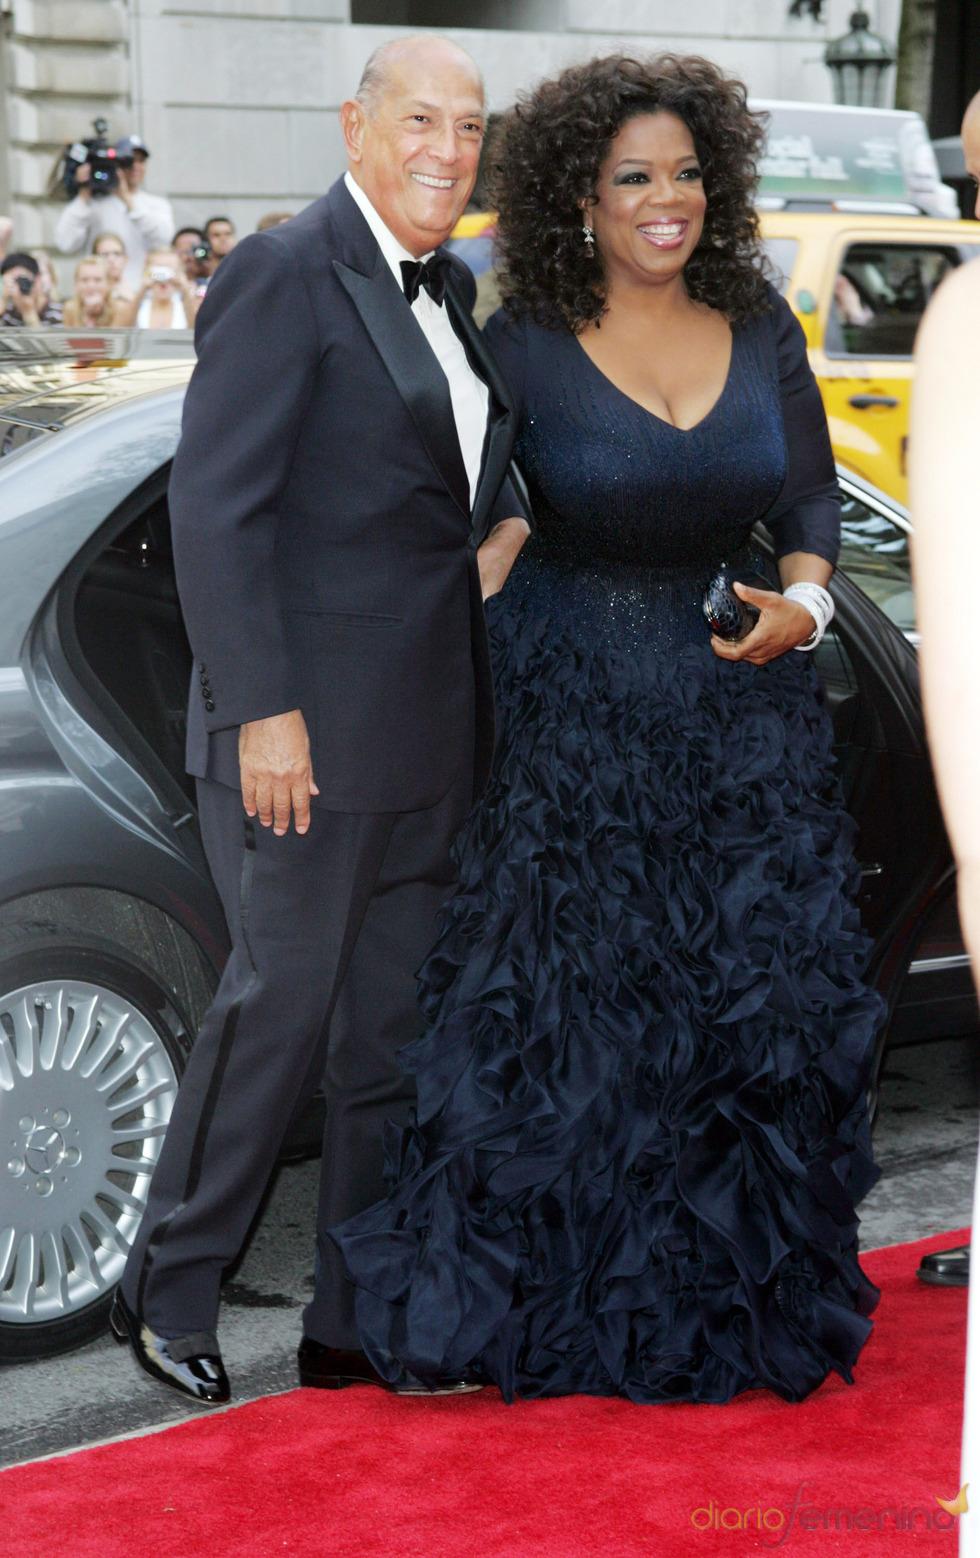 Oscar de la Renta and Oprah Winfrey en la gala del Costume Institute